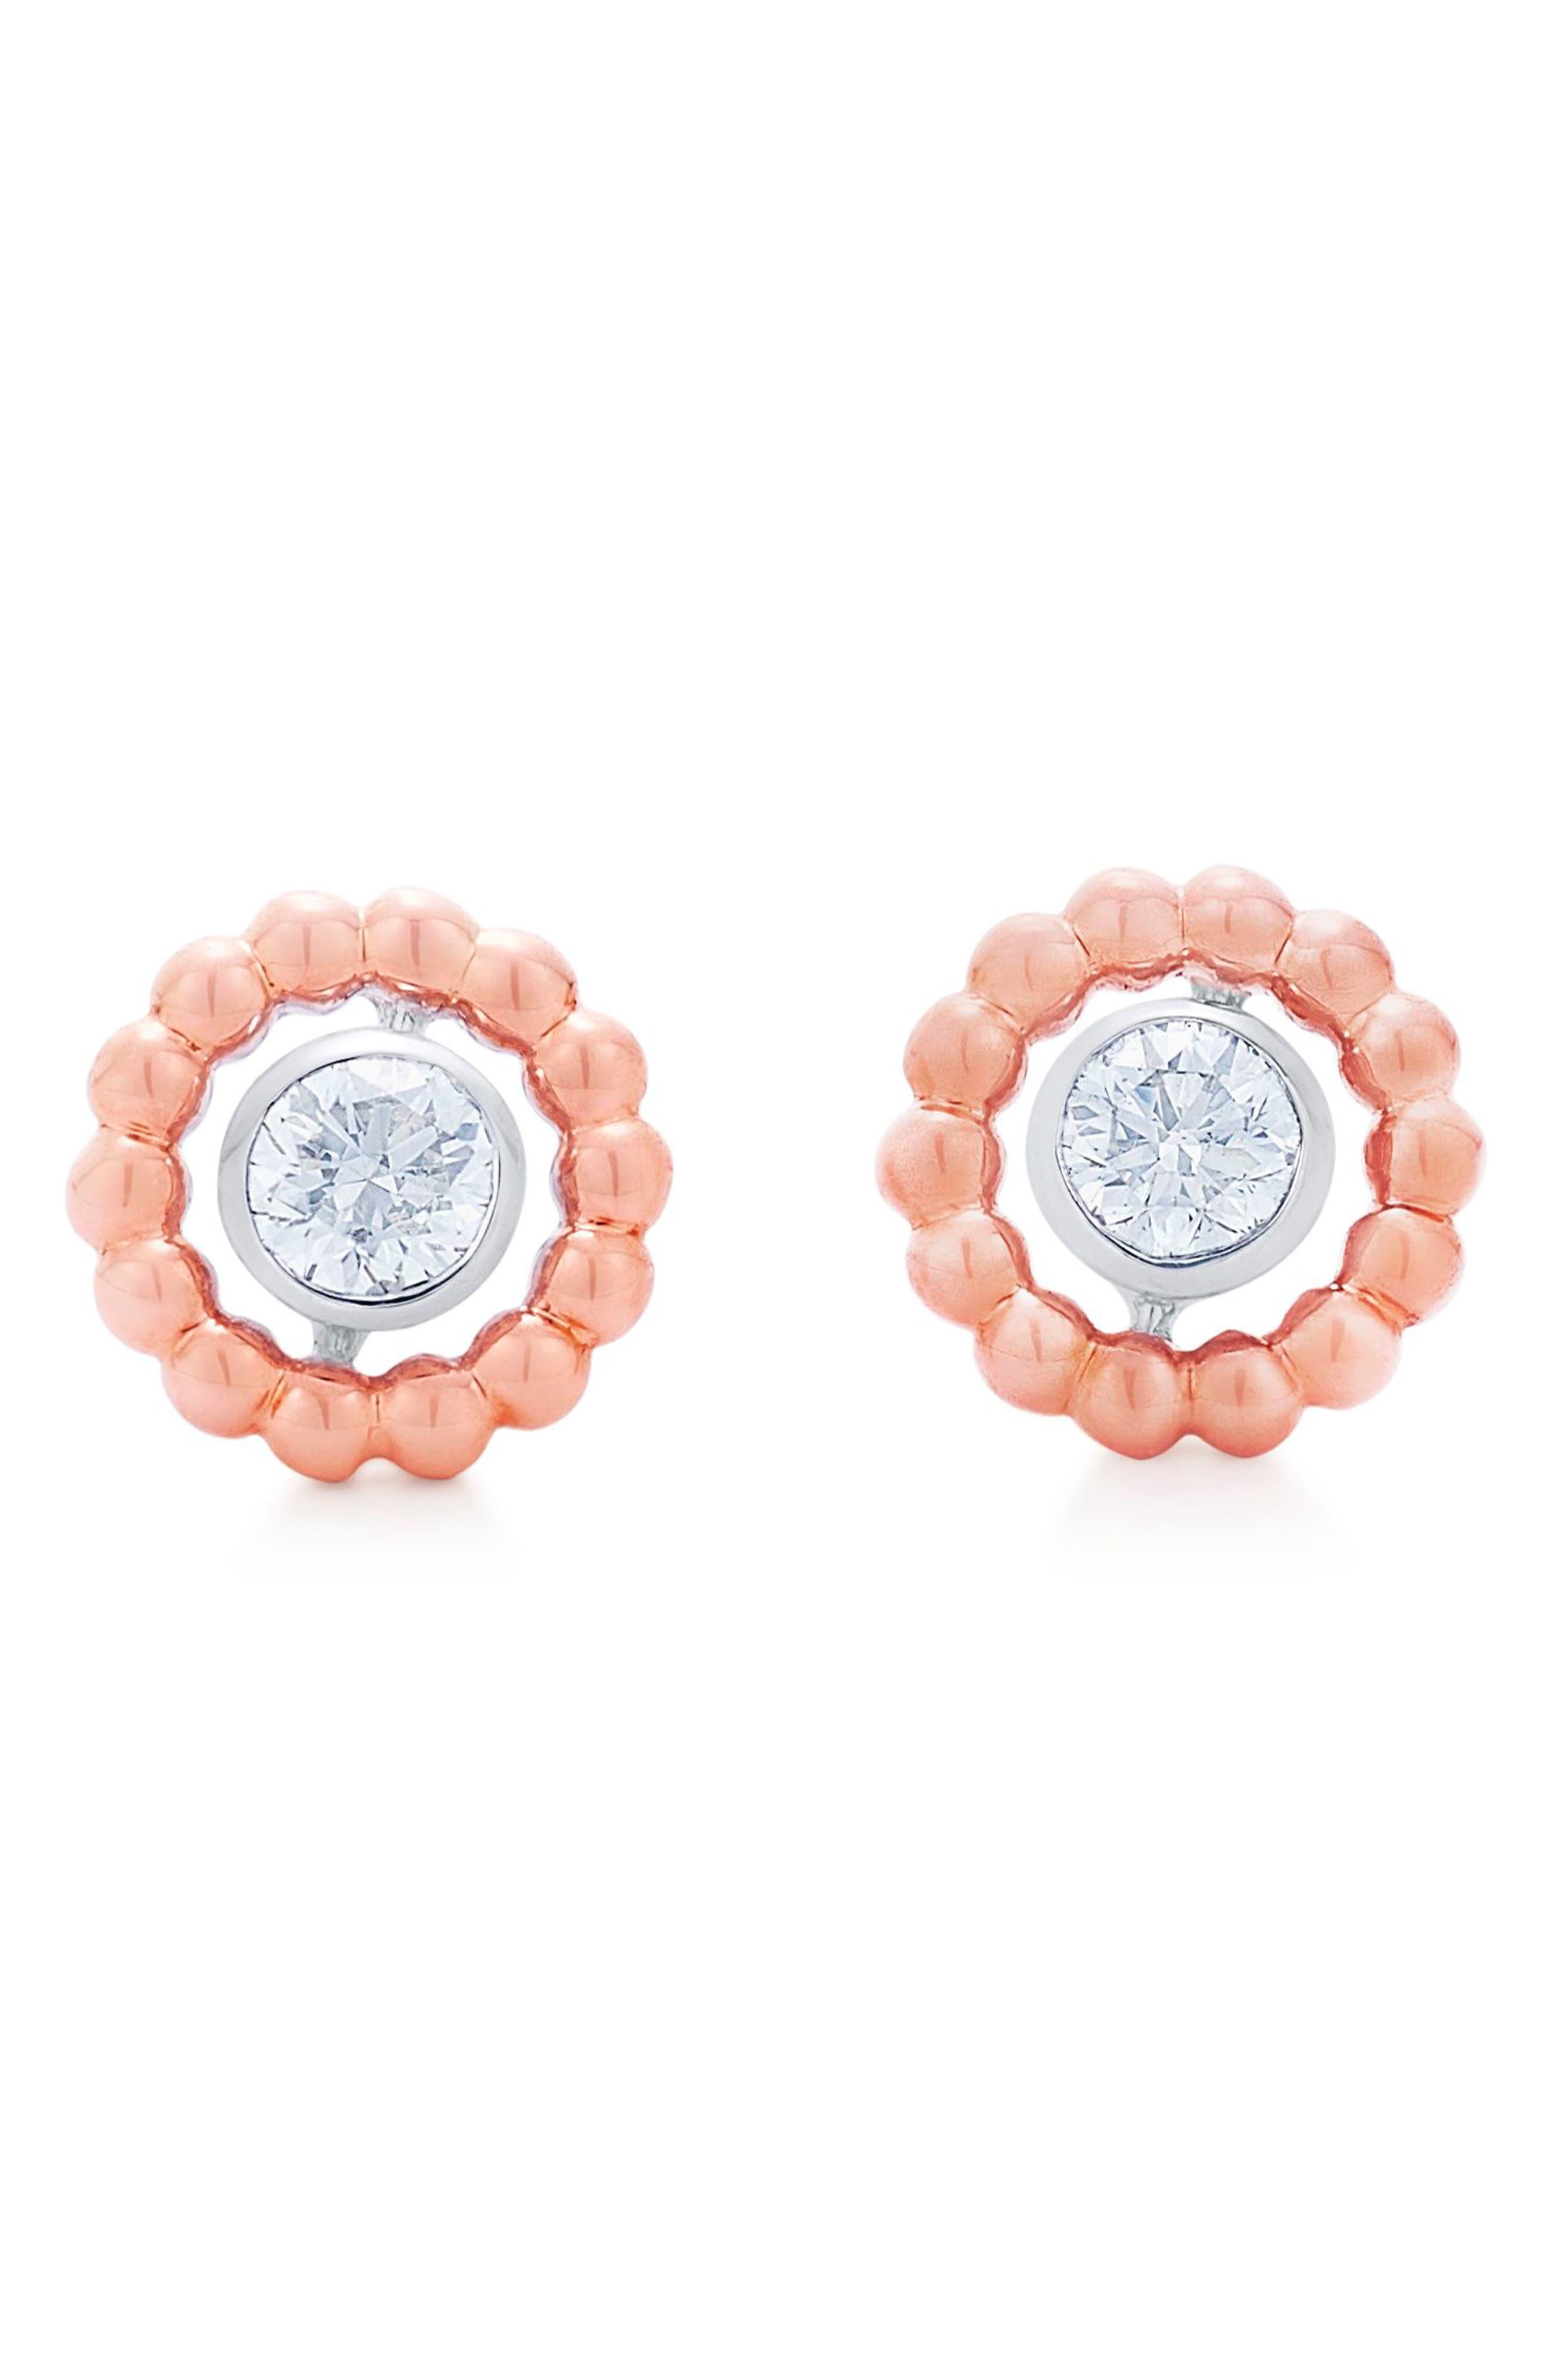 Beaded Diamond Stud Earrings,                         Main,                         color, Rose Gold